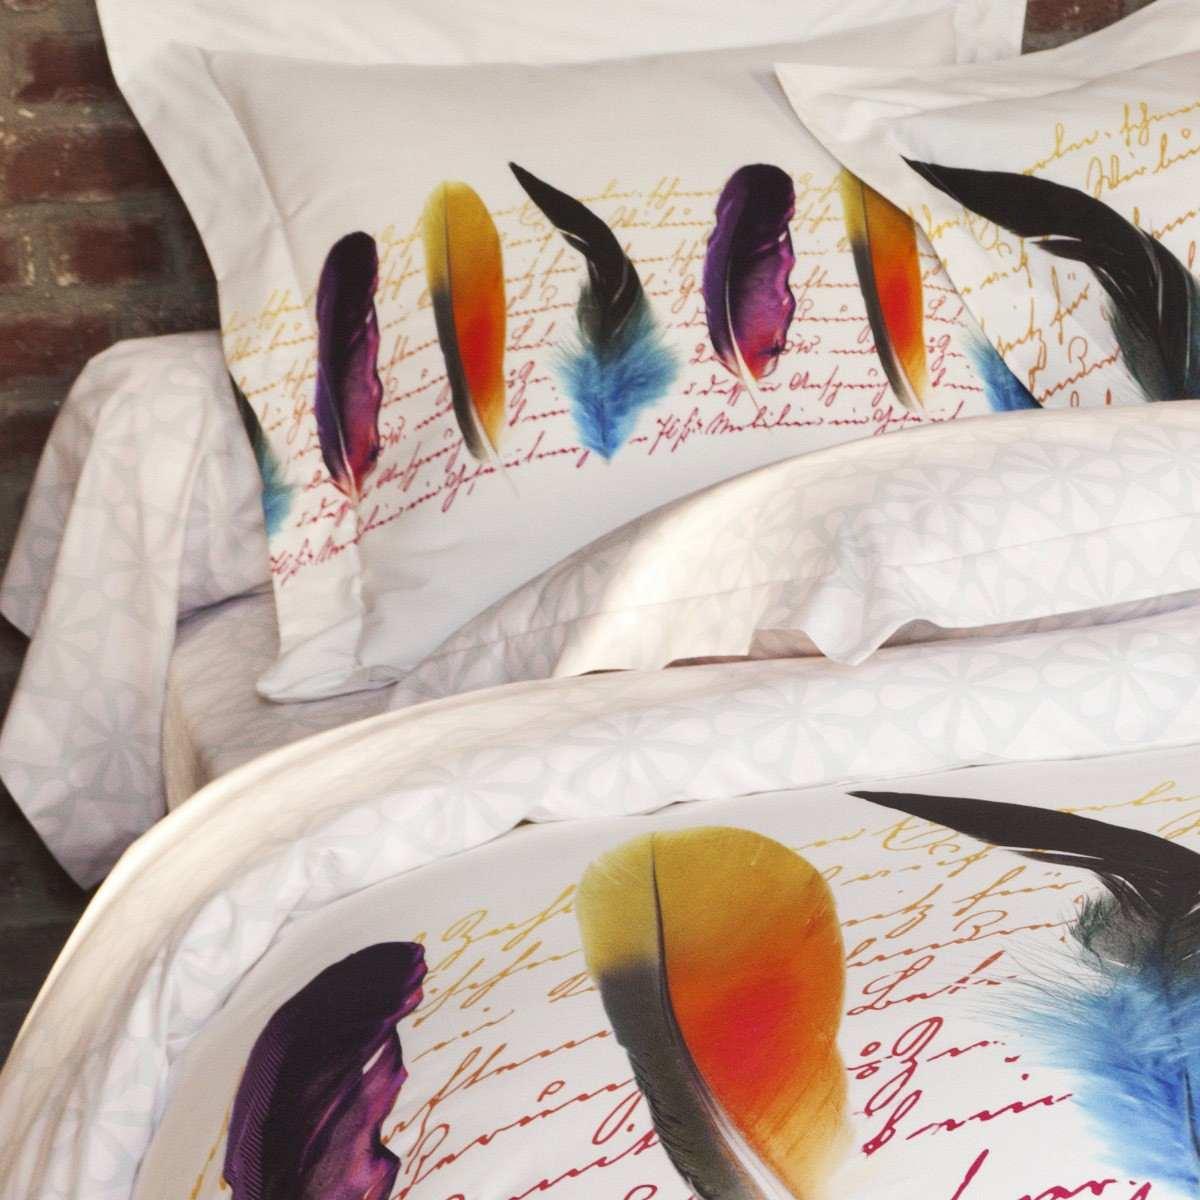 taie traversin plumetis soldes jusqu 39 55 linge de. Black Bedroom Furniture Sets. Home Design Ideas